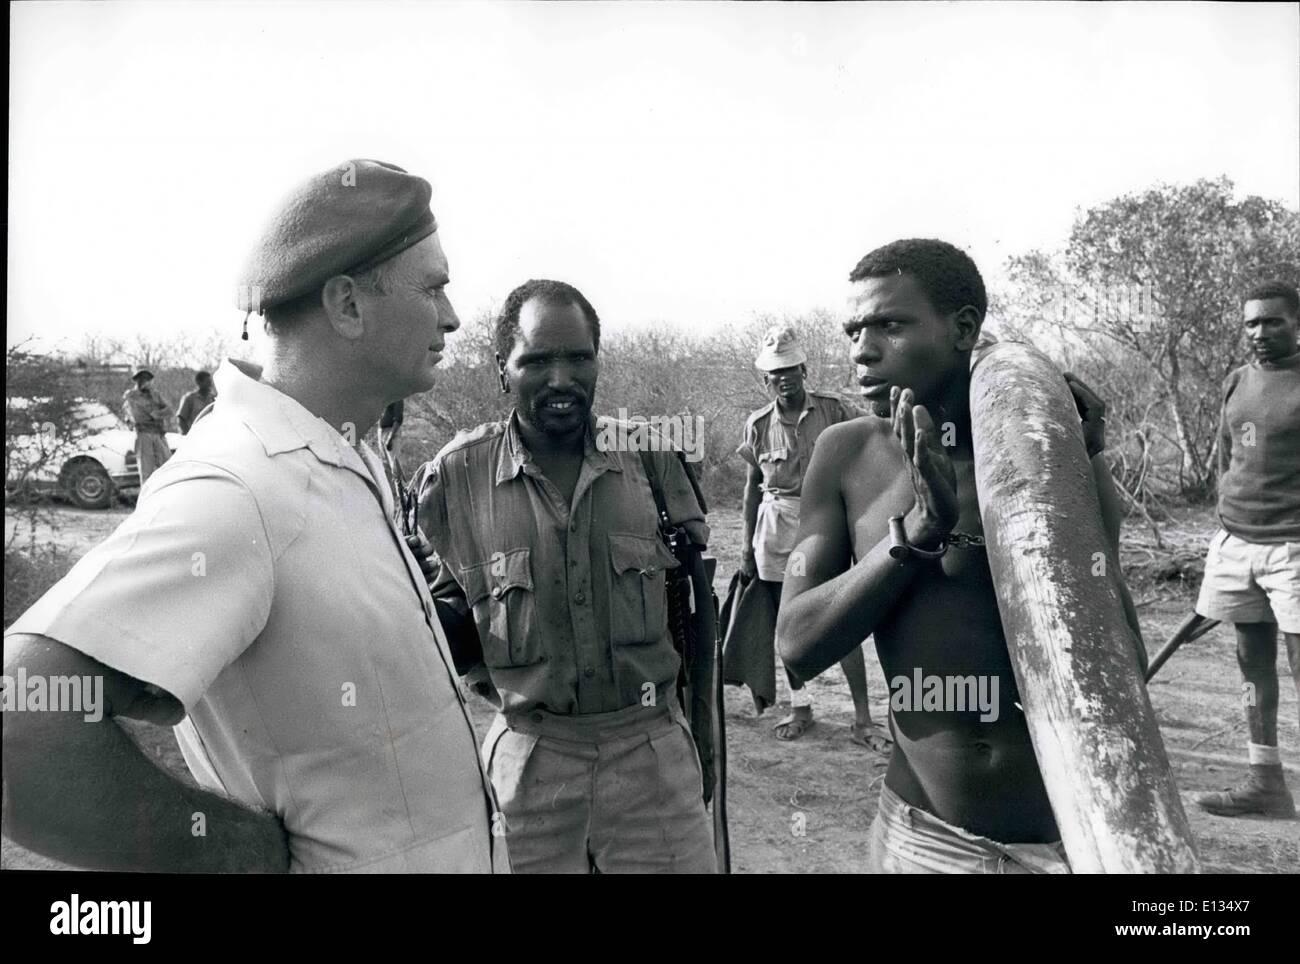 Feb. 28, 2012 - Govt. Against Poachers - Tsavo Natl.Pk., Kenya. David Sheldrick questions the poacher. - Stock Image